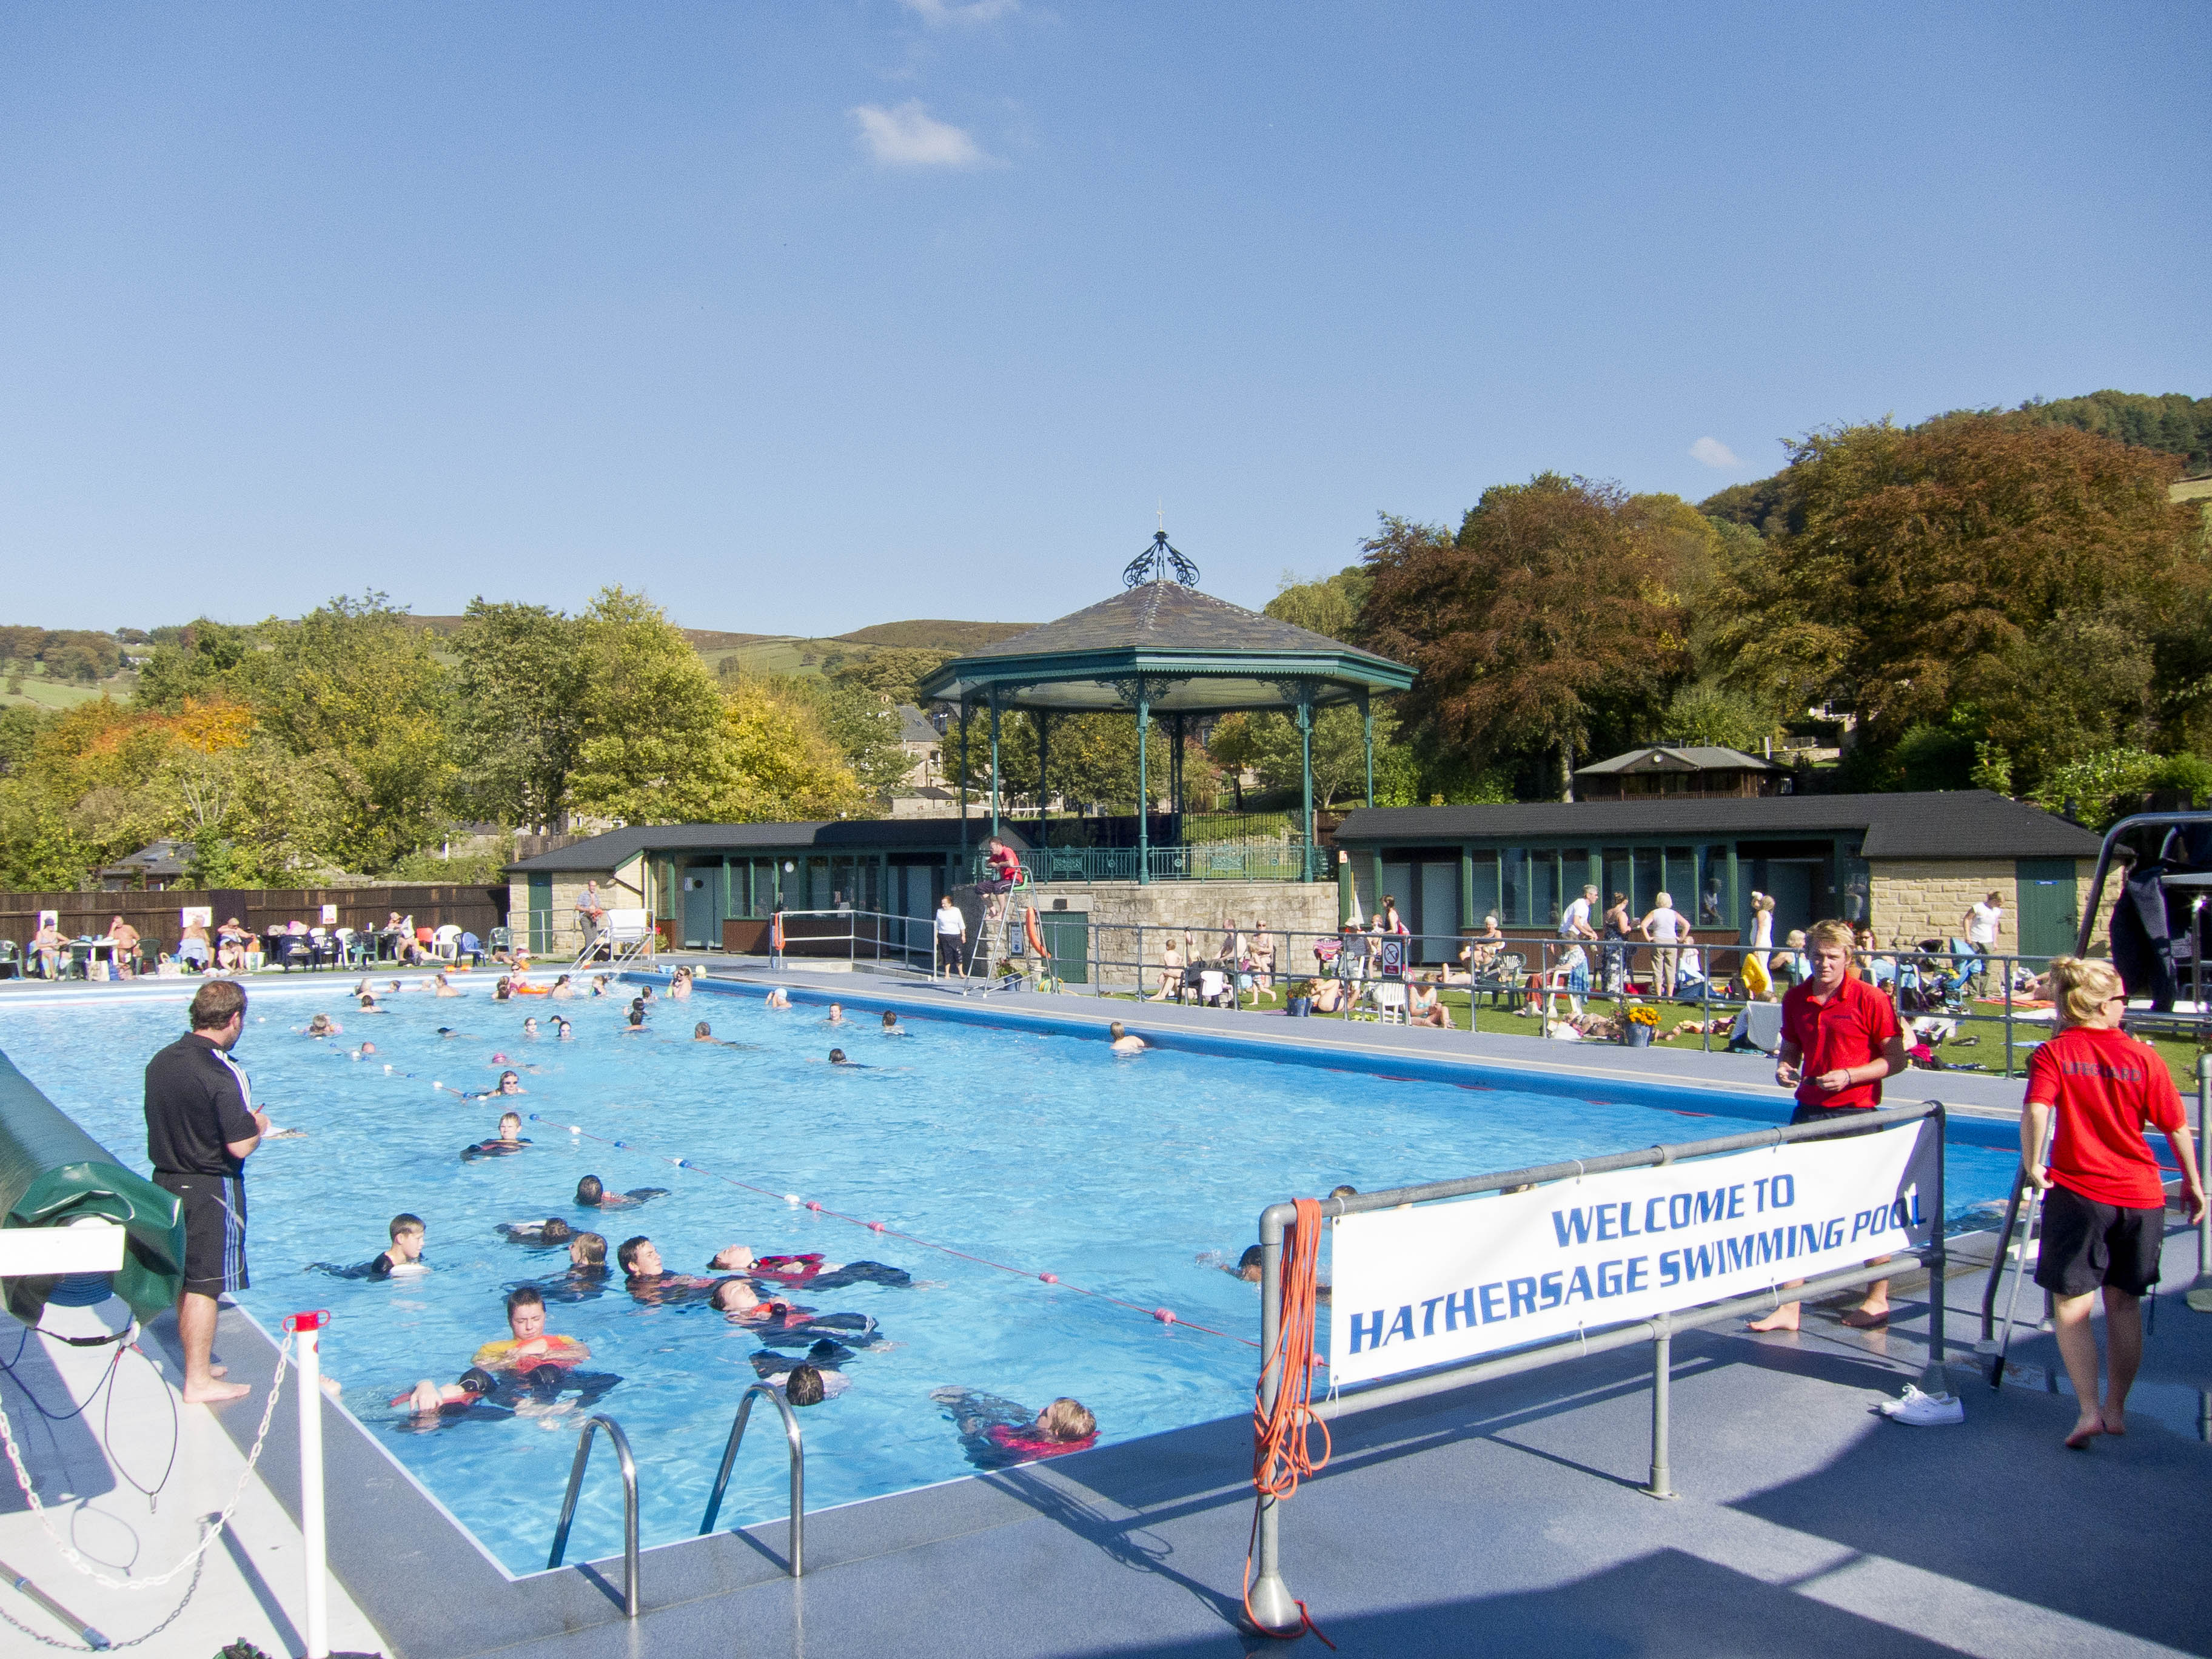 Hathersage Swimming Pool Hathersage Outdoor Swimming Pool